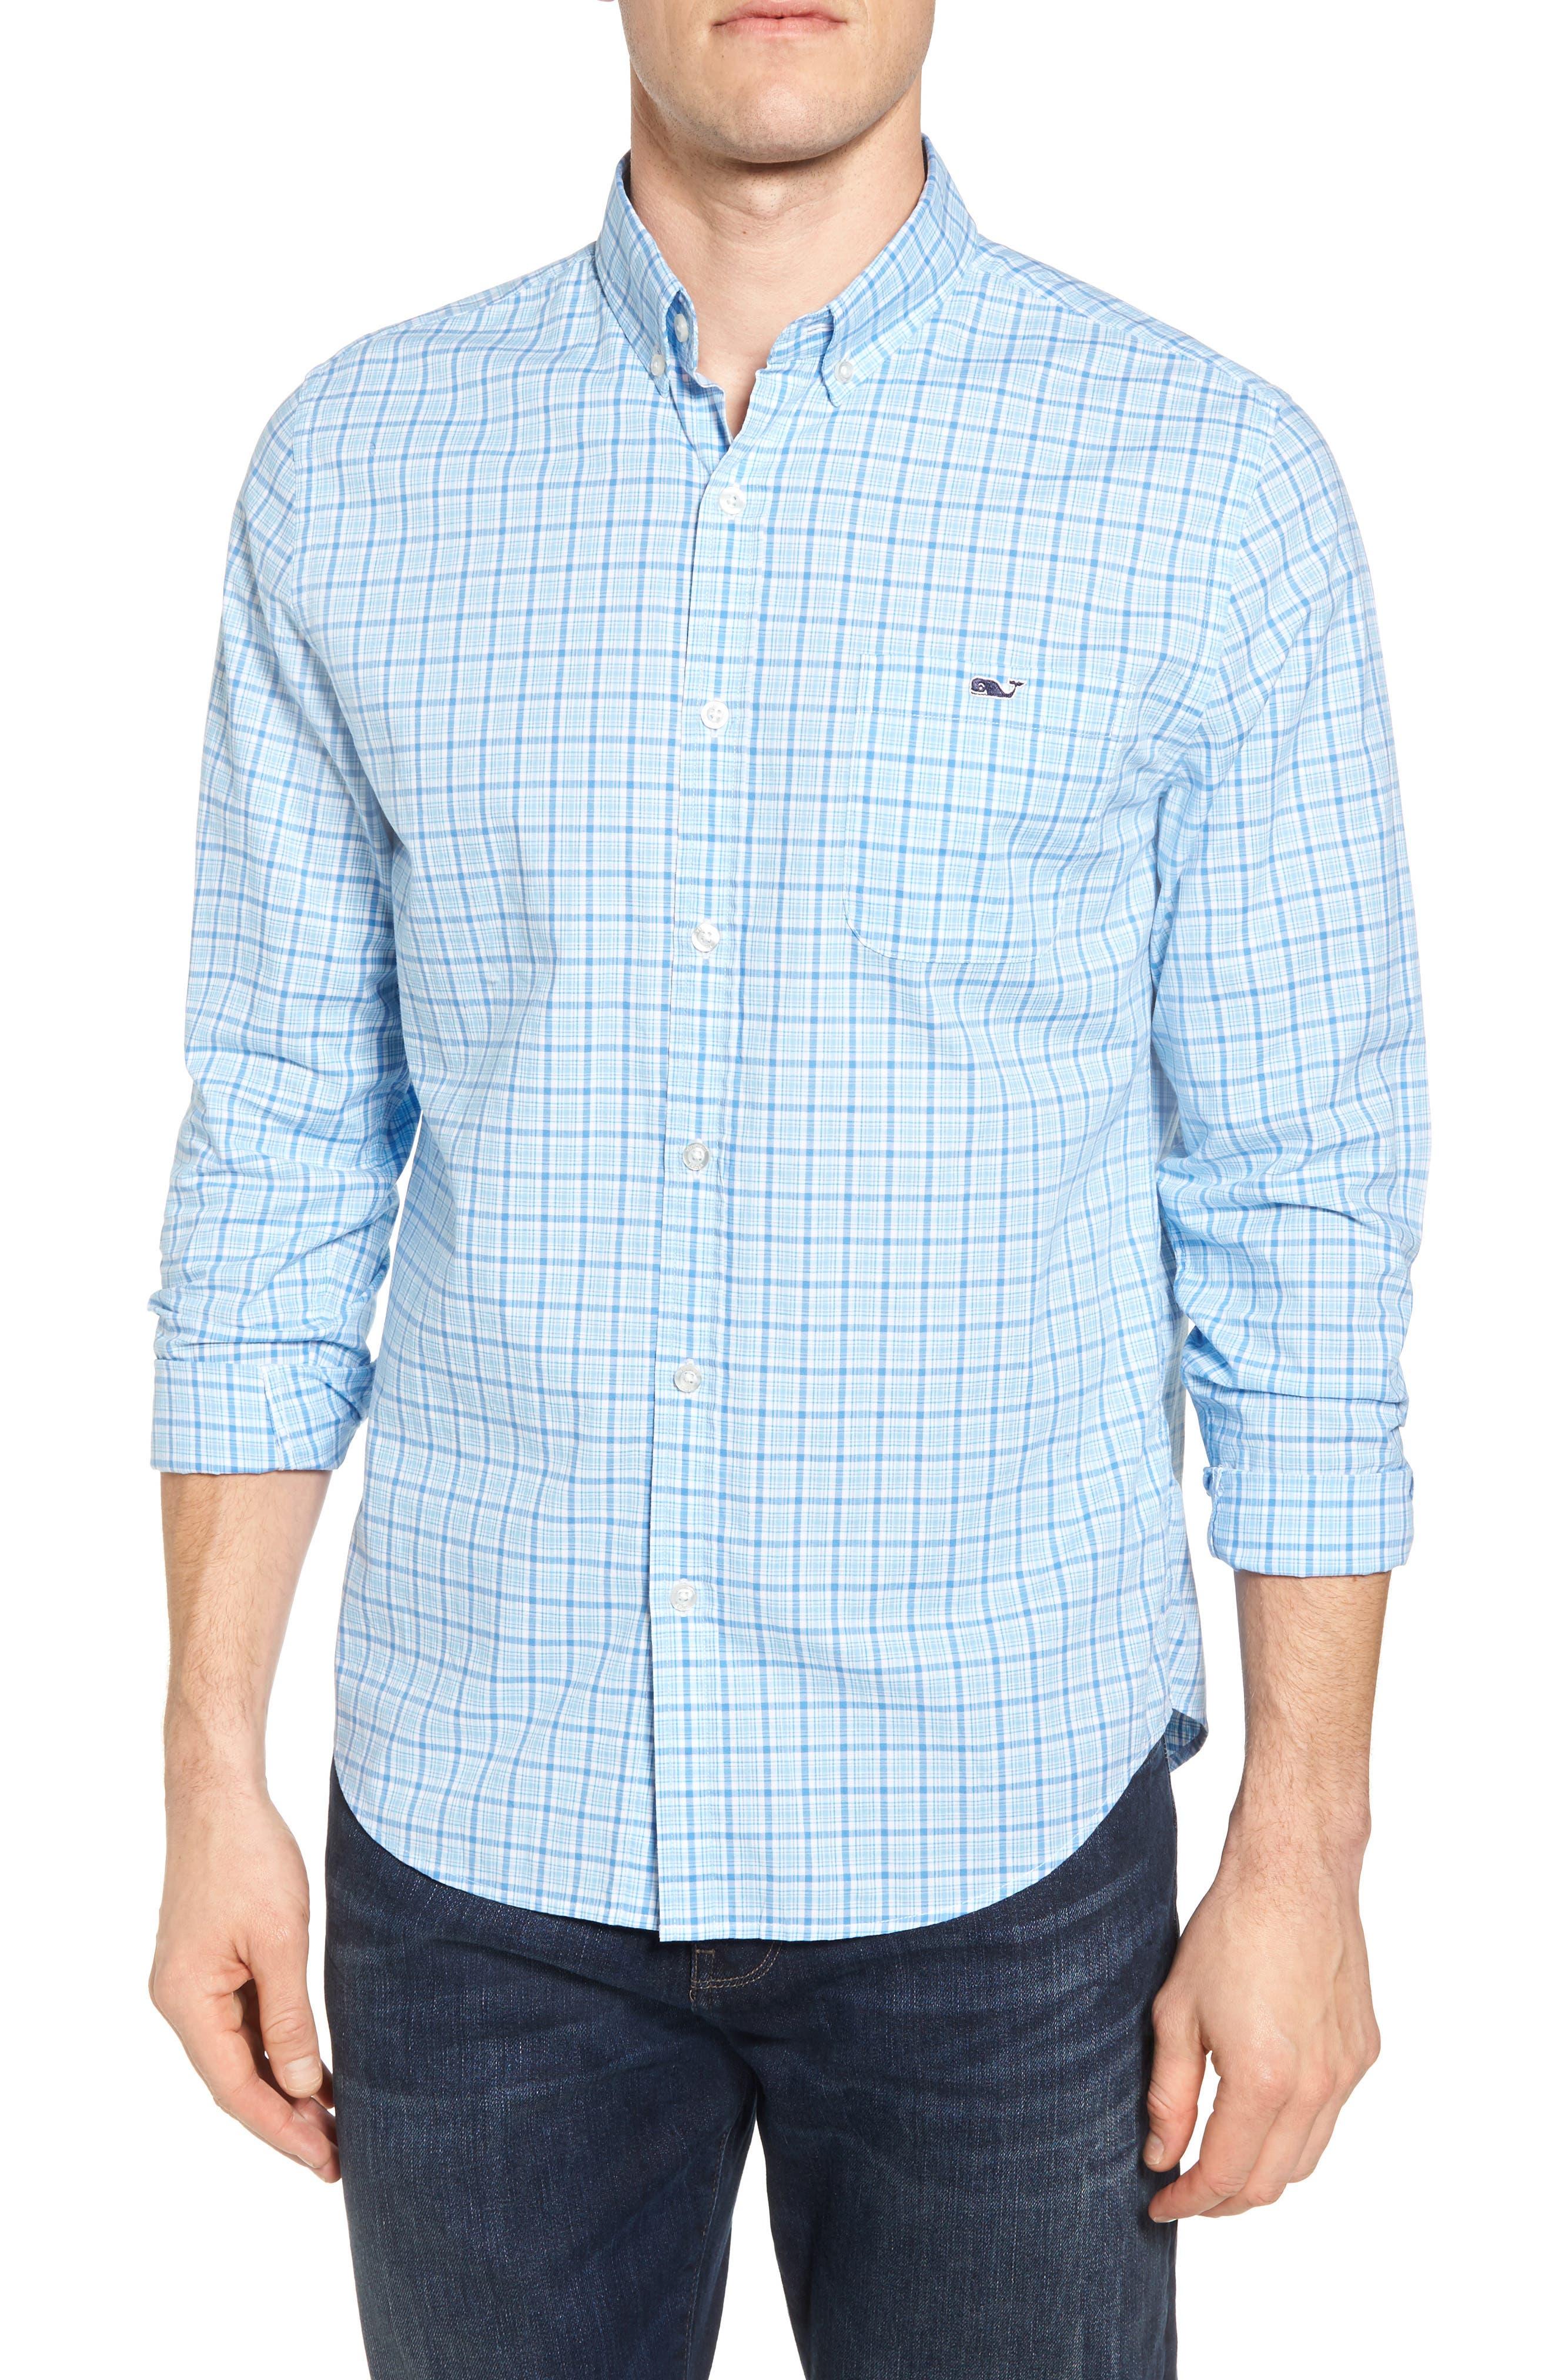 Main Image - vineyard vines Seawatch Slim Fit Plaid Sport Shirt